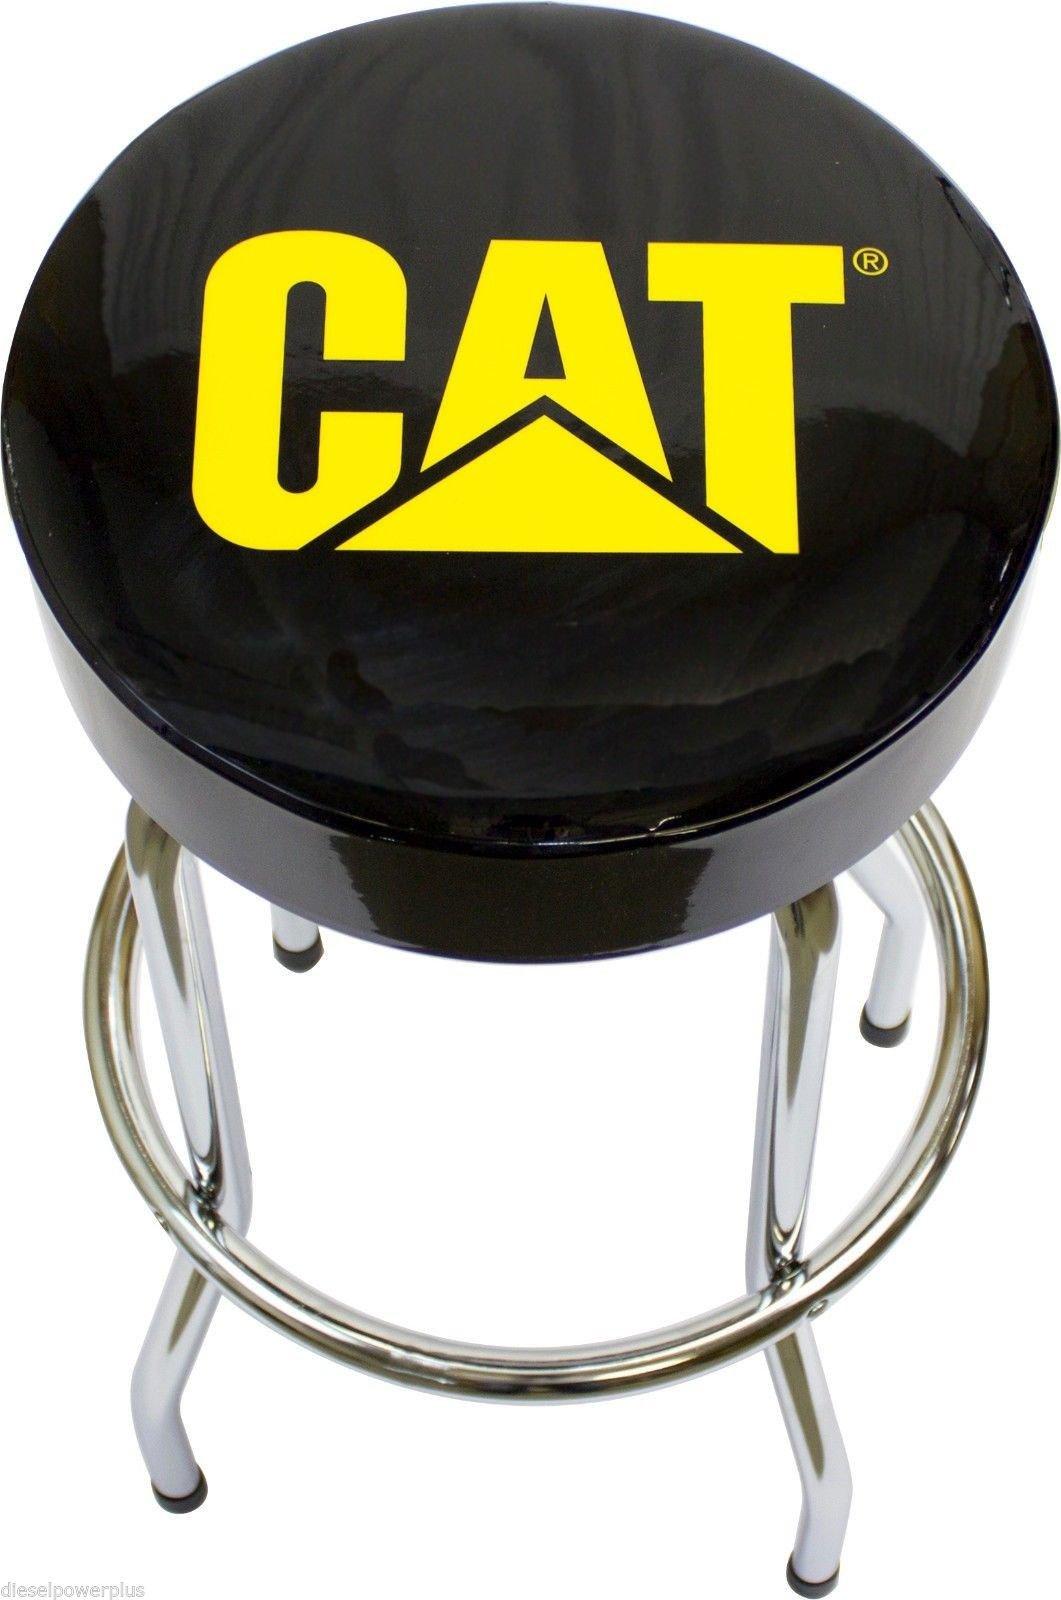 CAT Garage Stool Cat Caterpillar Semi Truck Motor Tractor Bar Stool Chair Shop Bench Garage Tract